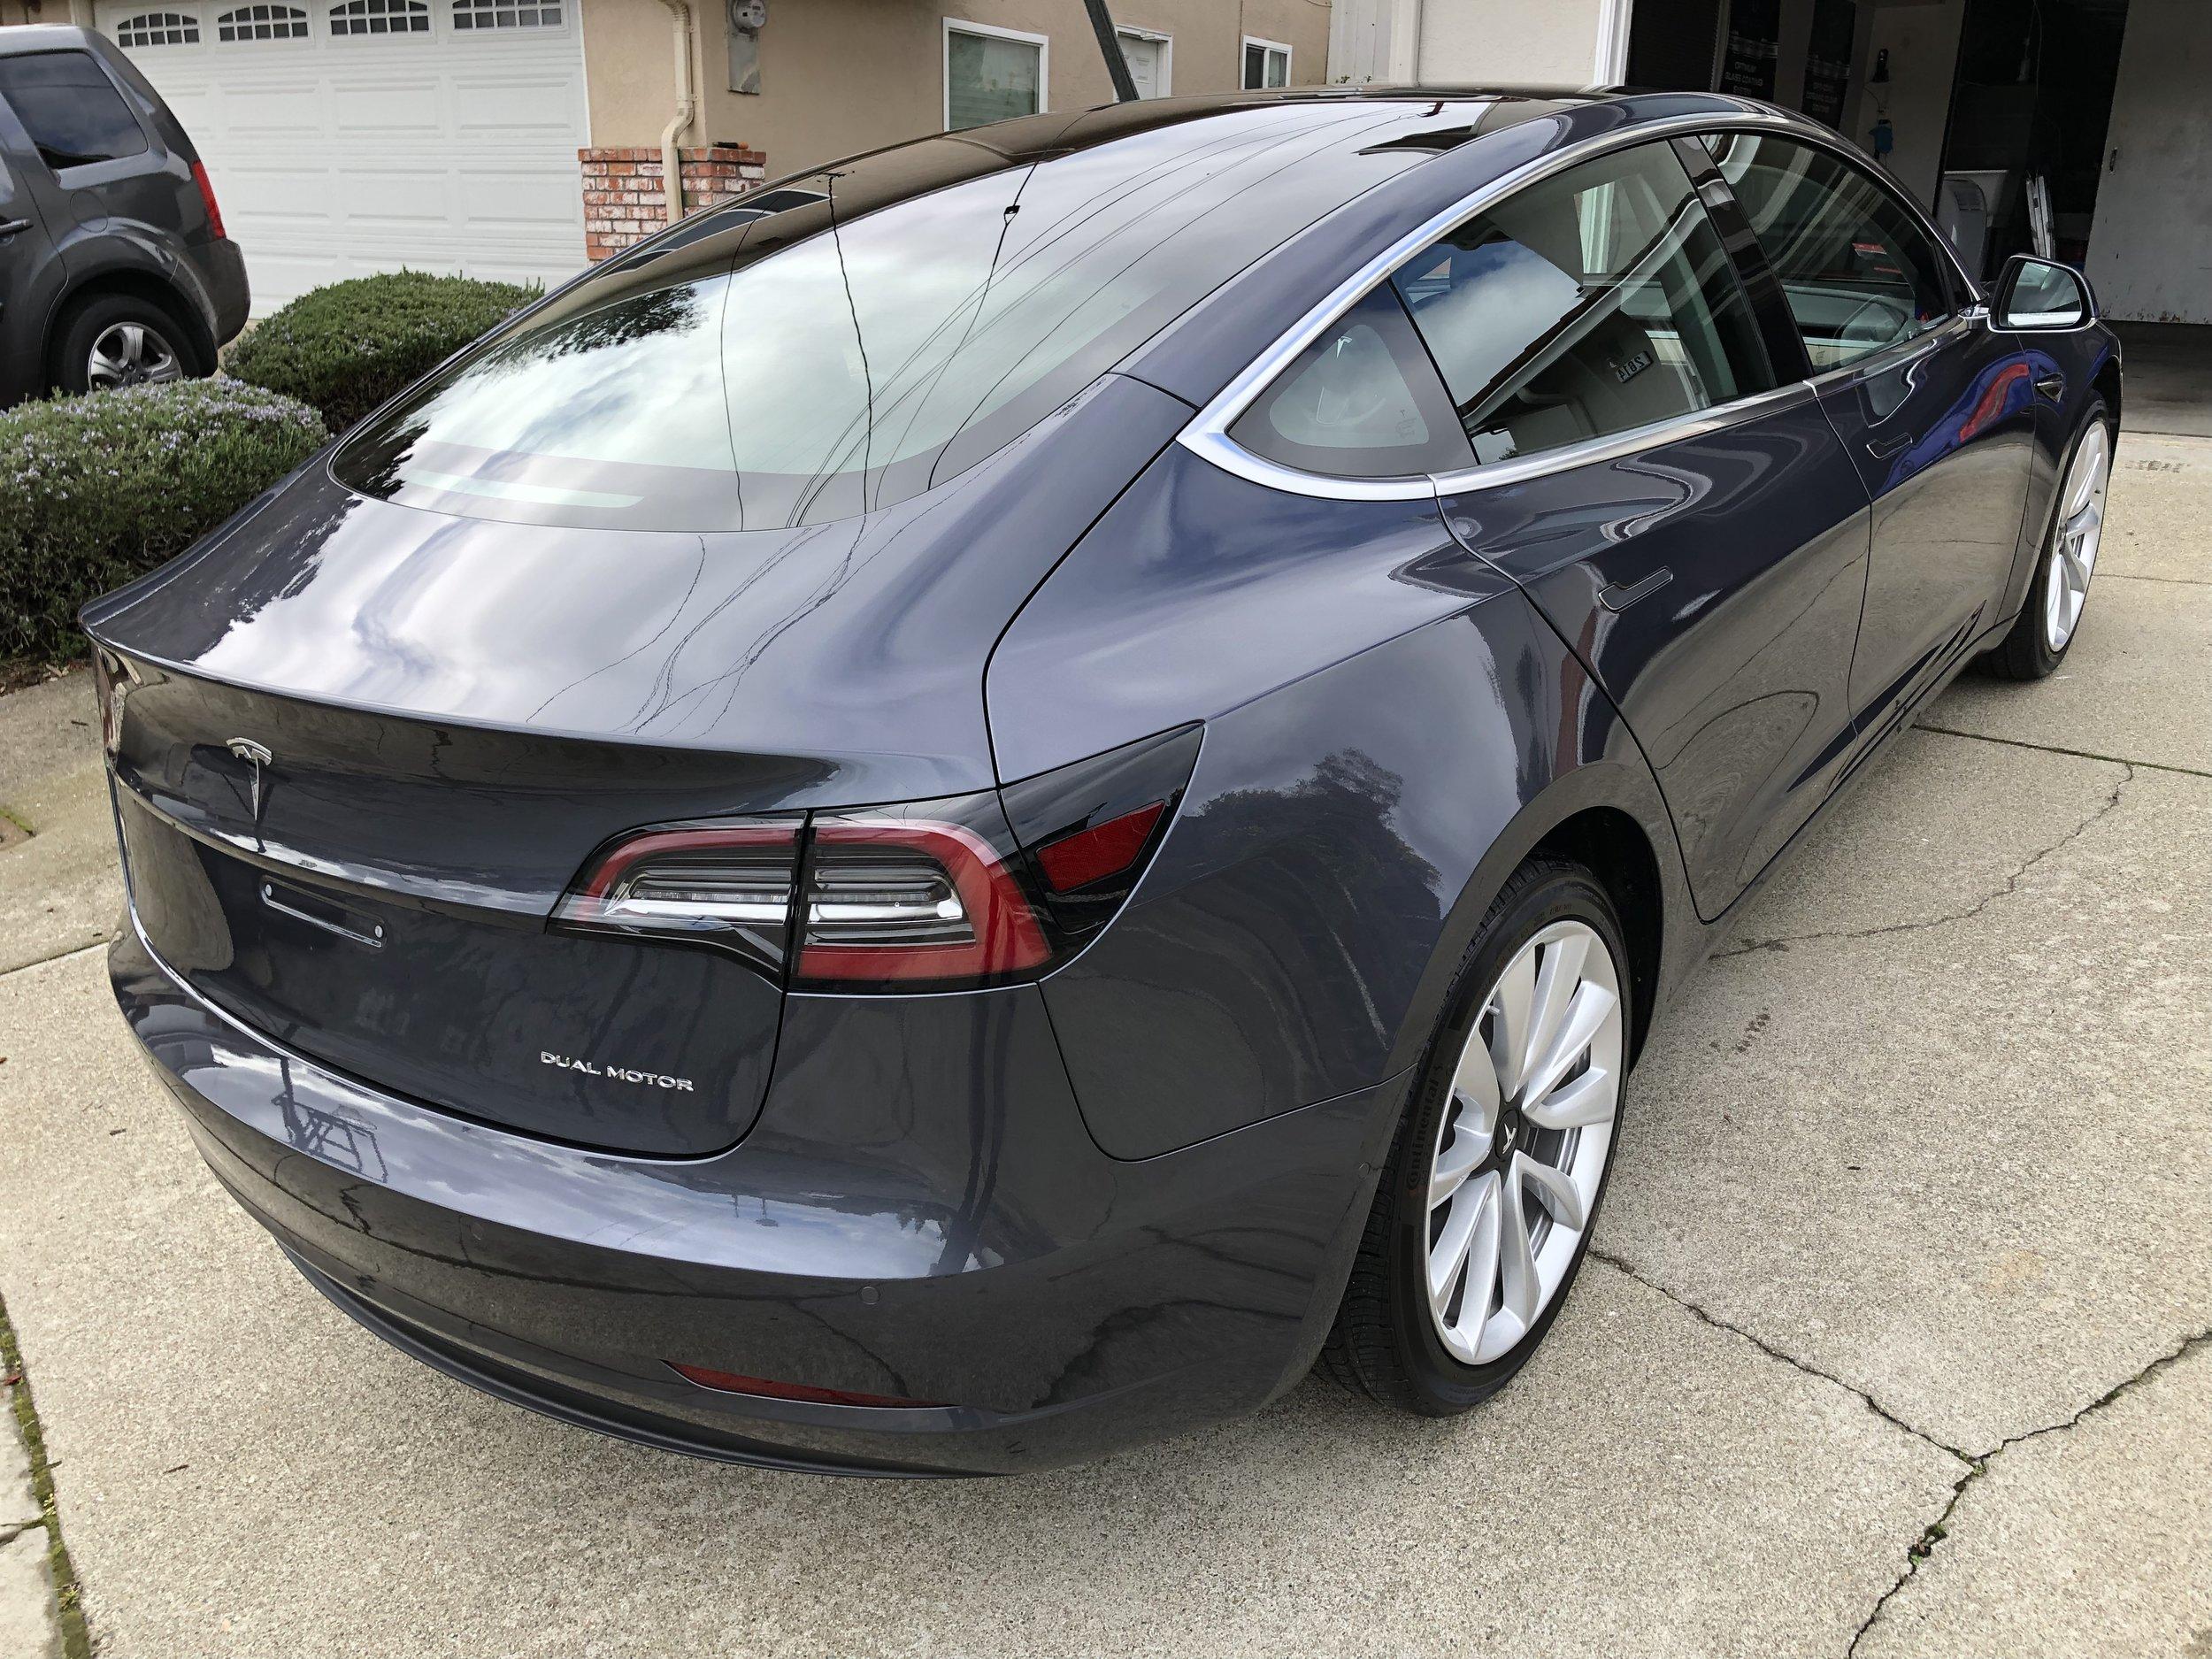 F/ür Tesla Model 3 2017 2018 2019 Silver Door Lock Cover T/ürschloss-Schlie/ßkappe Edelstahl Auto Protection Zubeh/ör,4Pcs T/ürschlossabdeckung